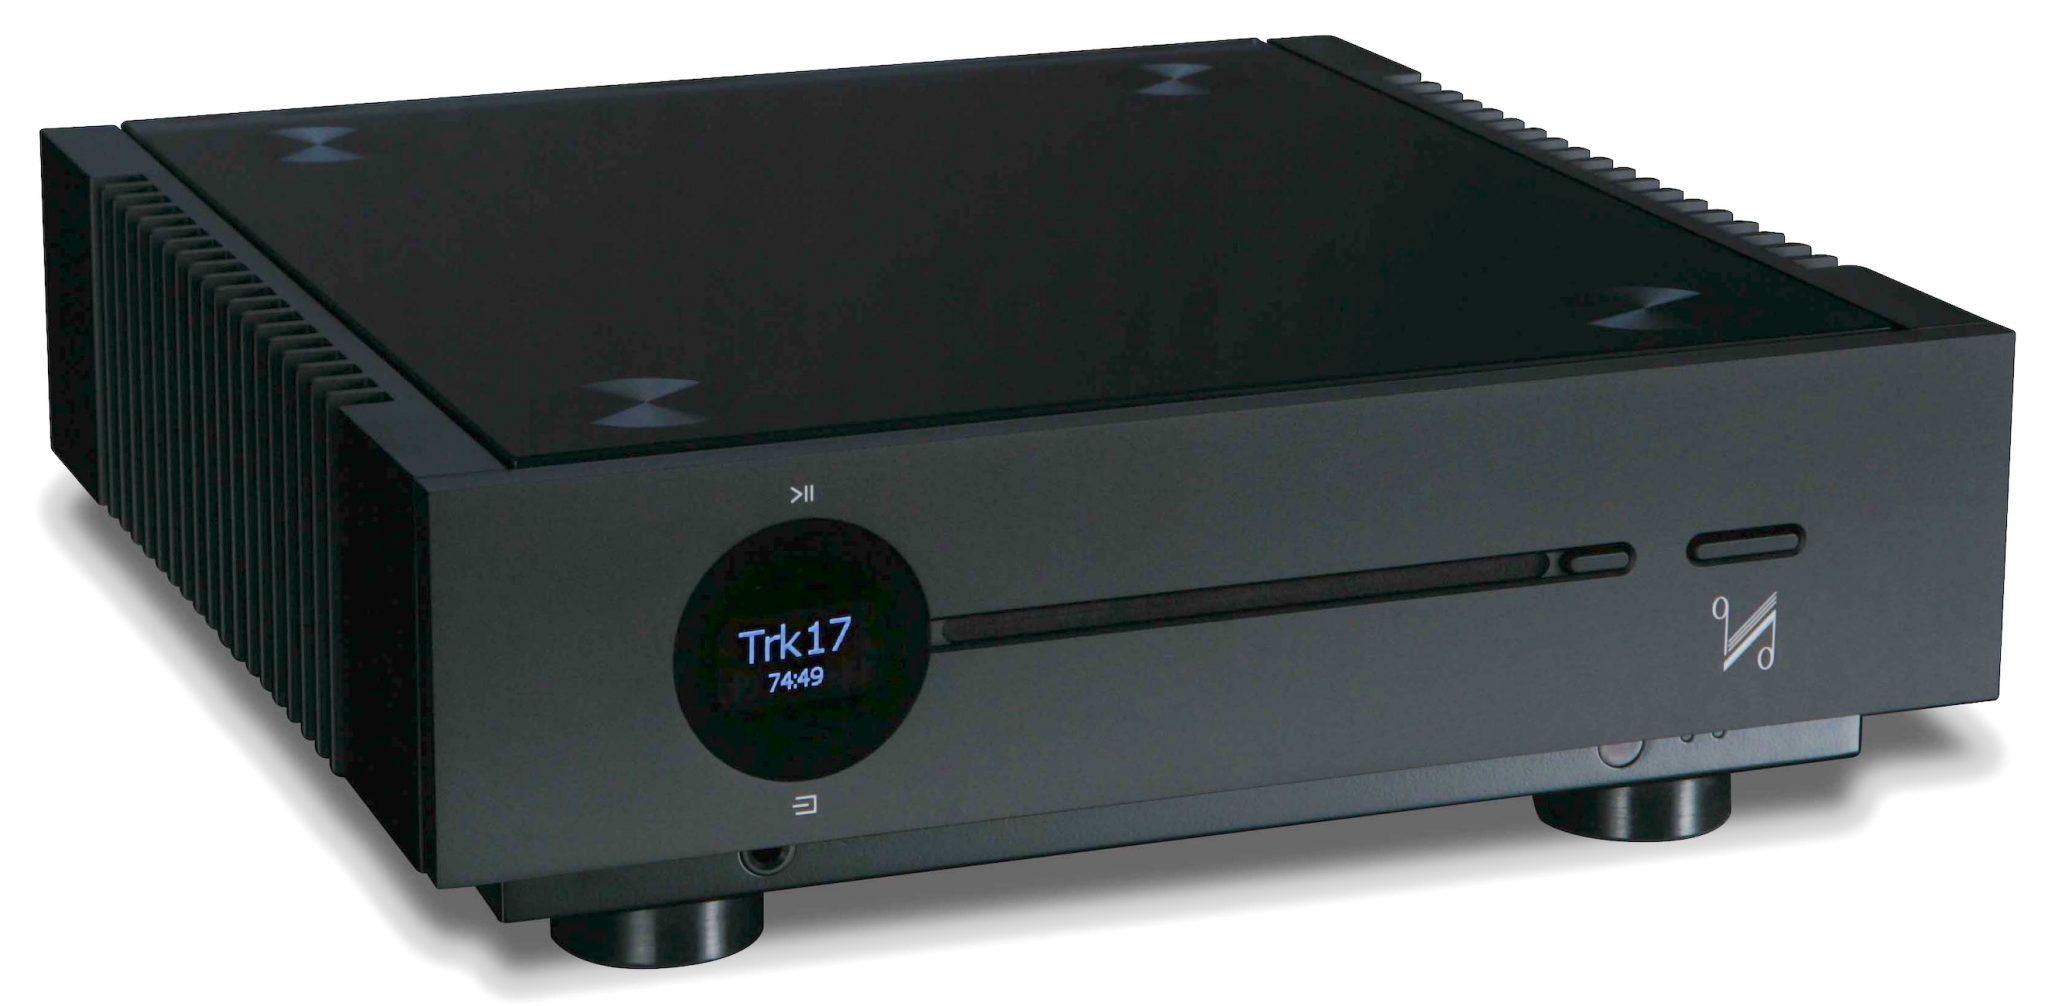 Quad Artera Solus one-box hi-fi system